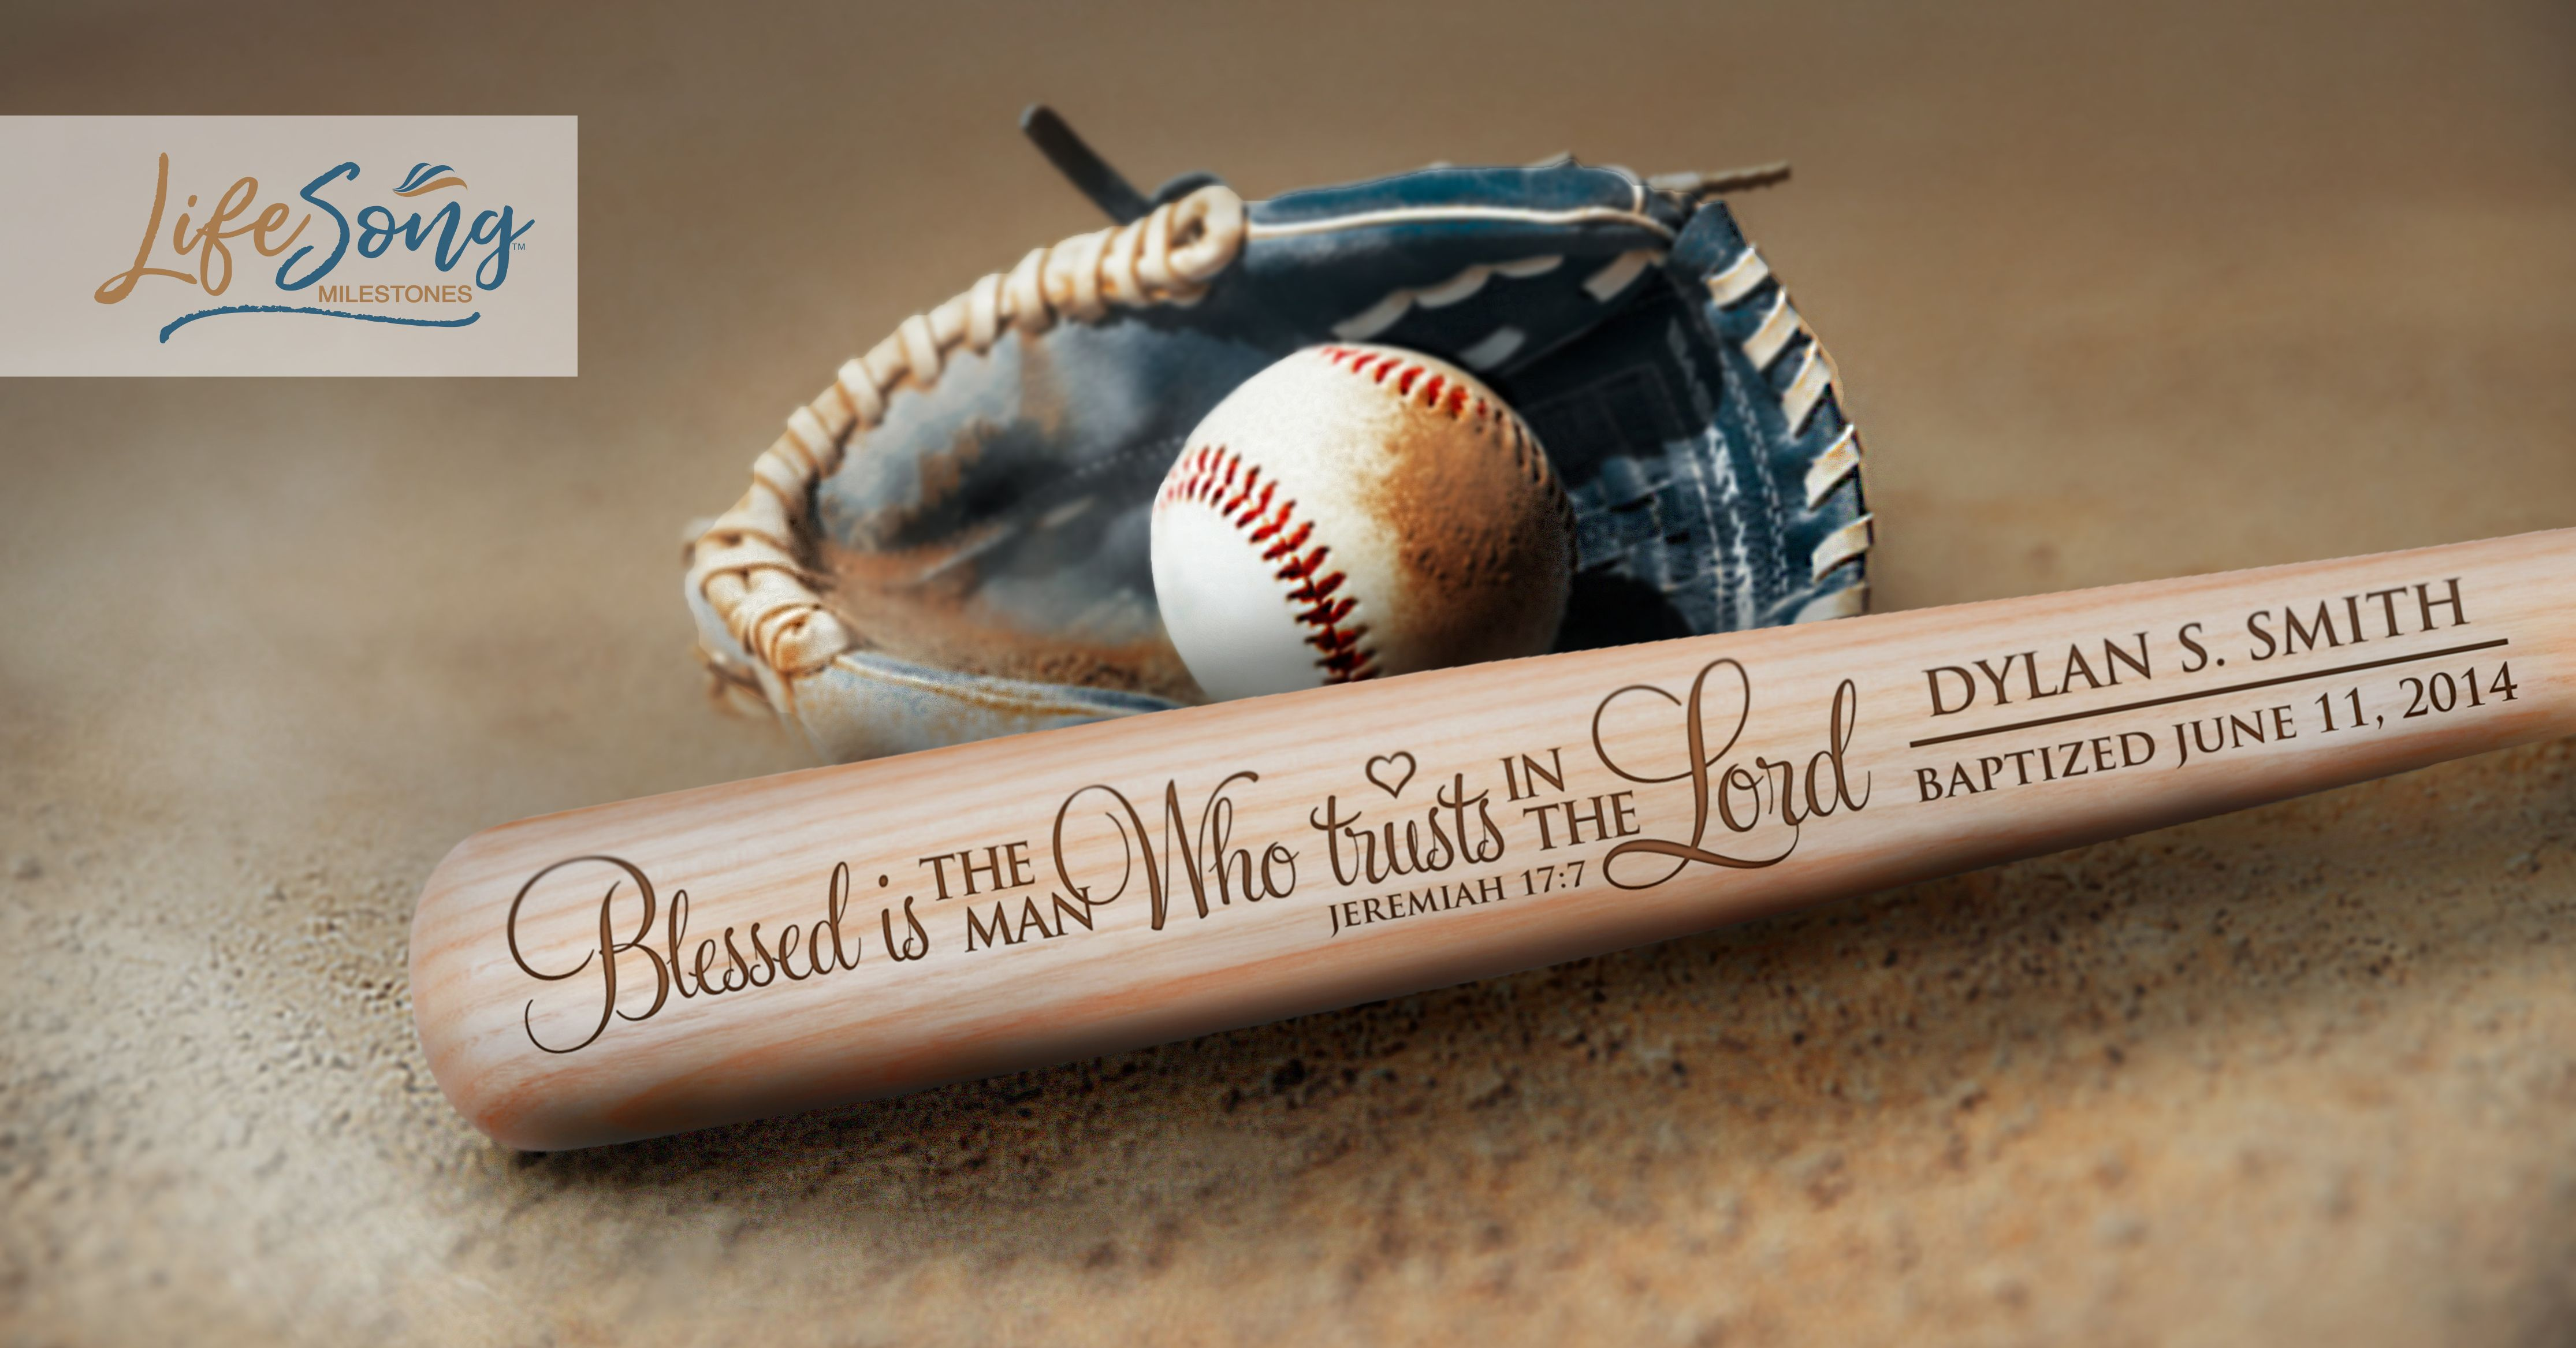 Customized Personalized Your Text Here Wood Mini Custom Baseball Bat Wedding Gro